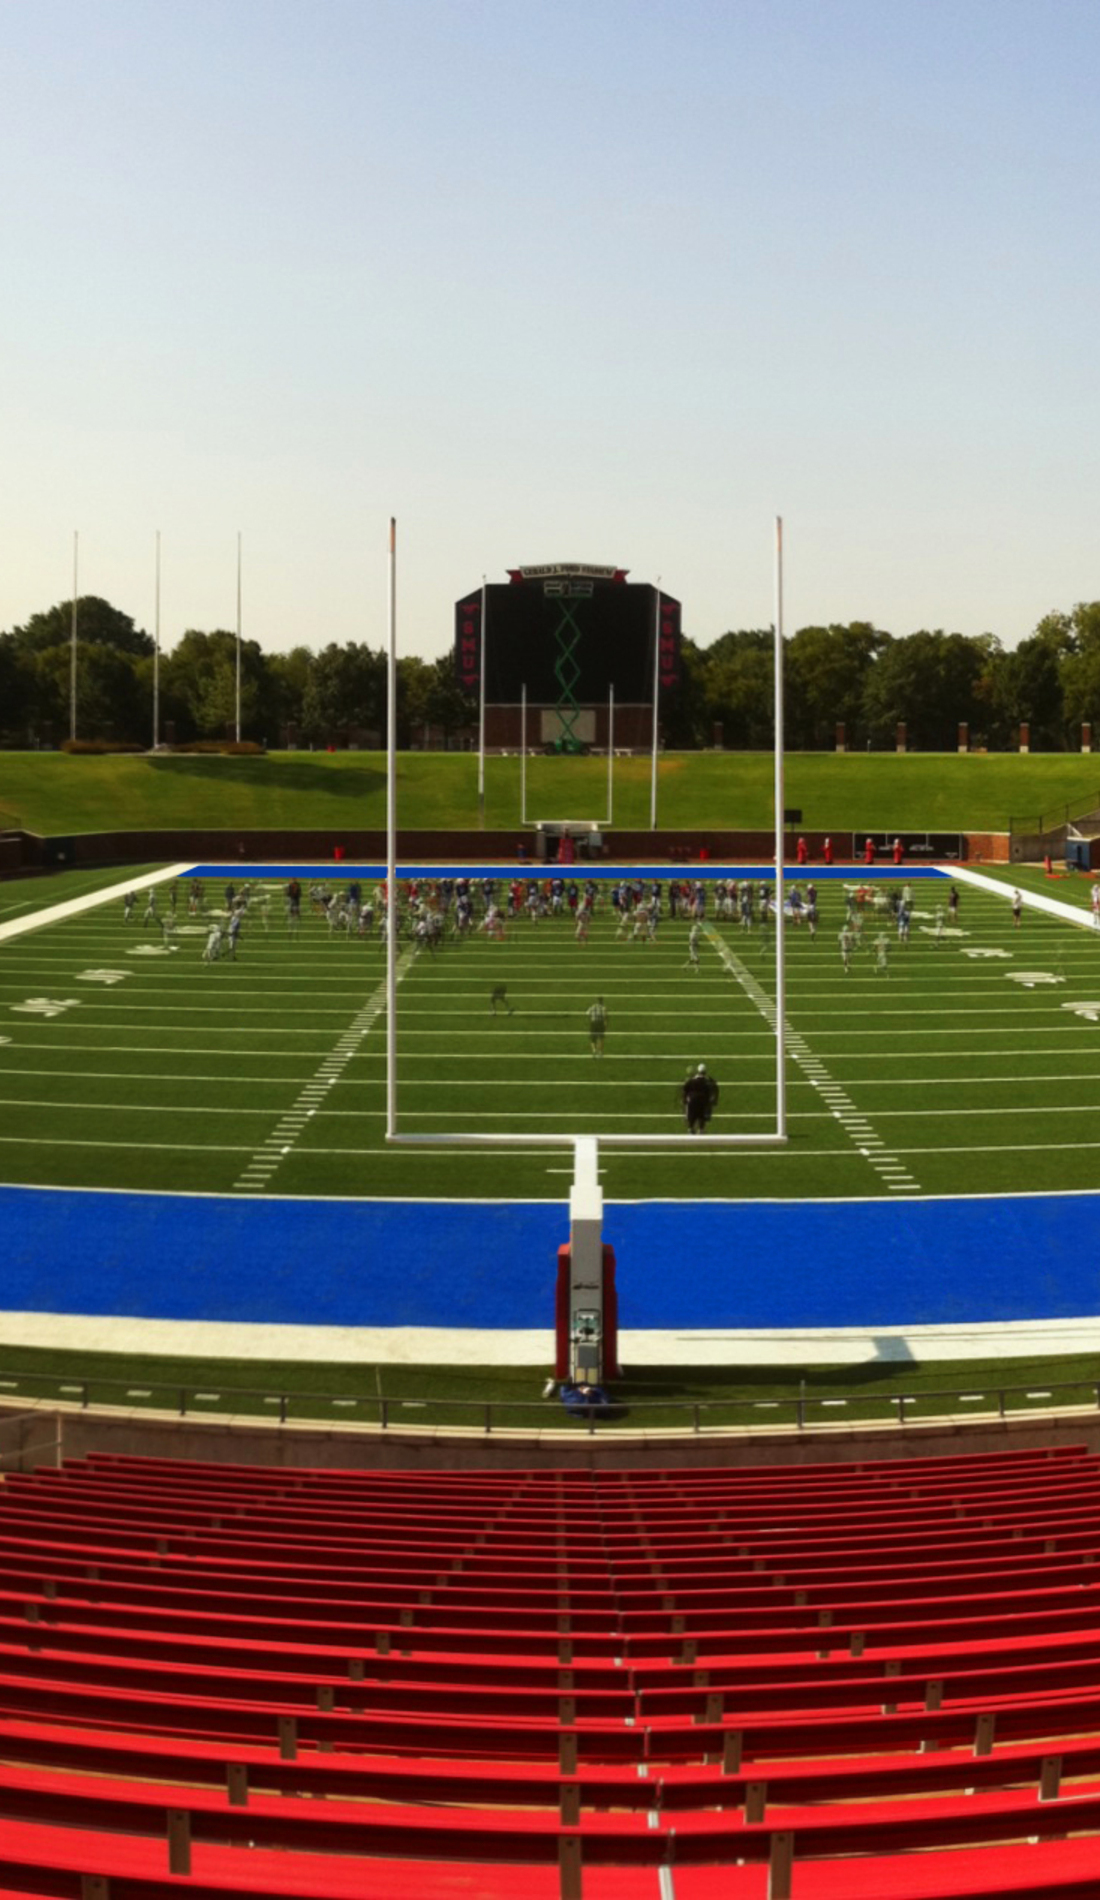 A SMU Mustangs Football live event